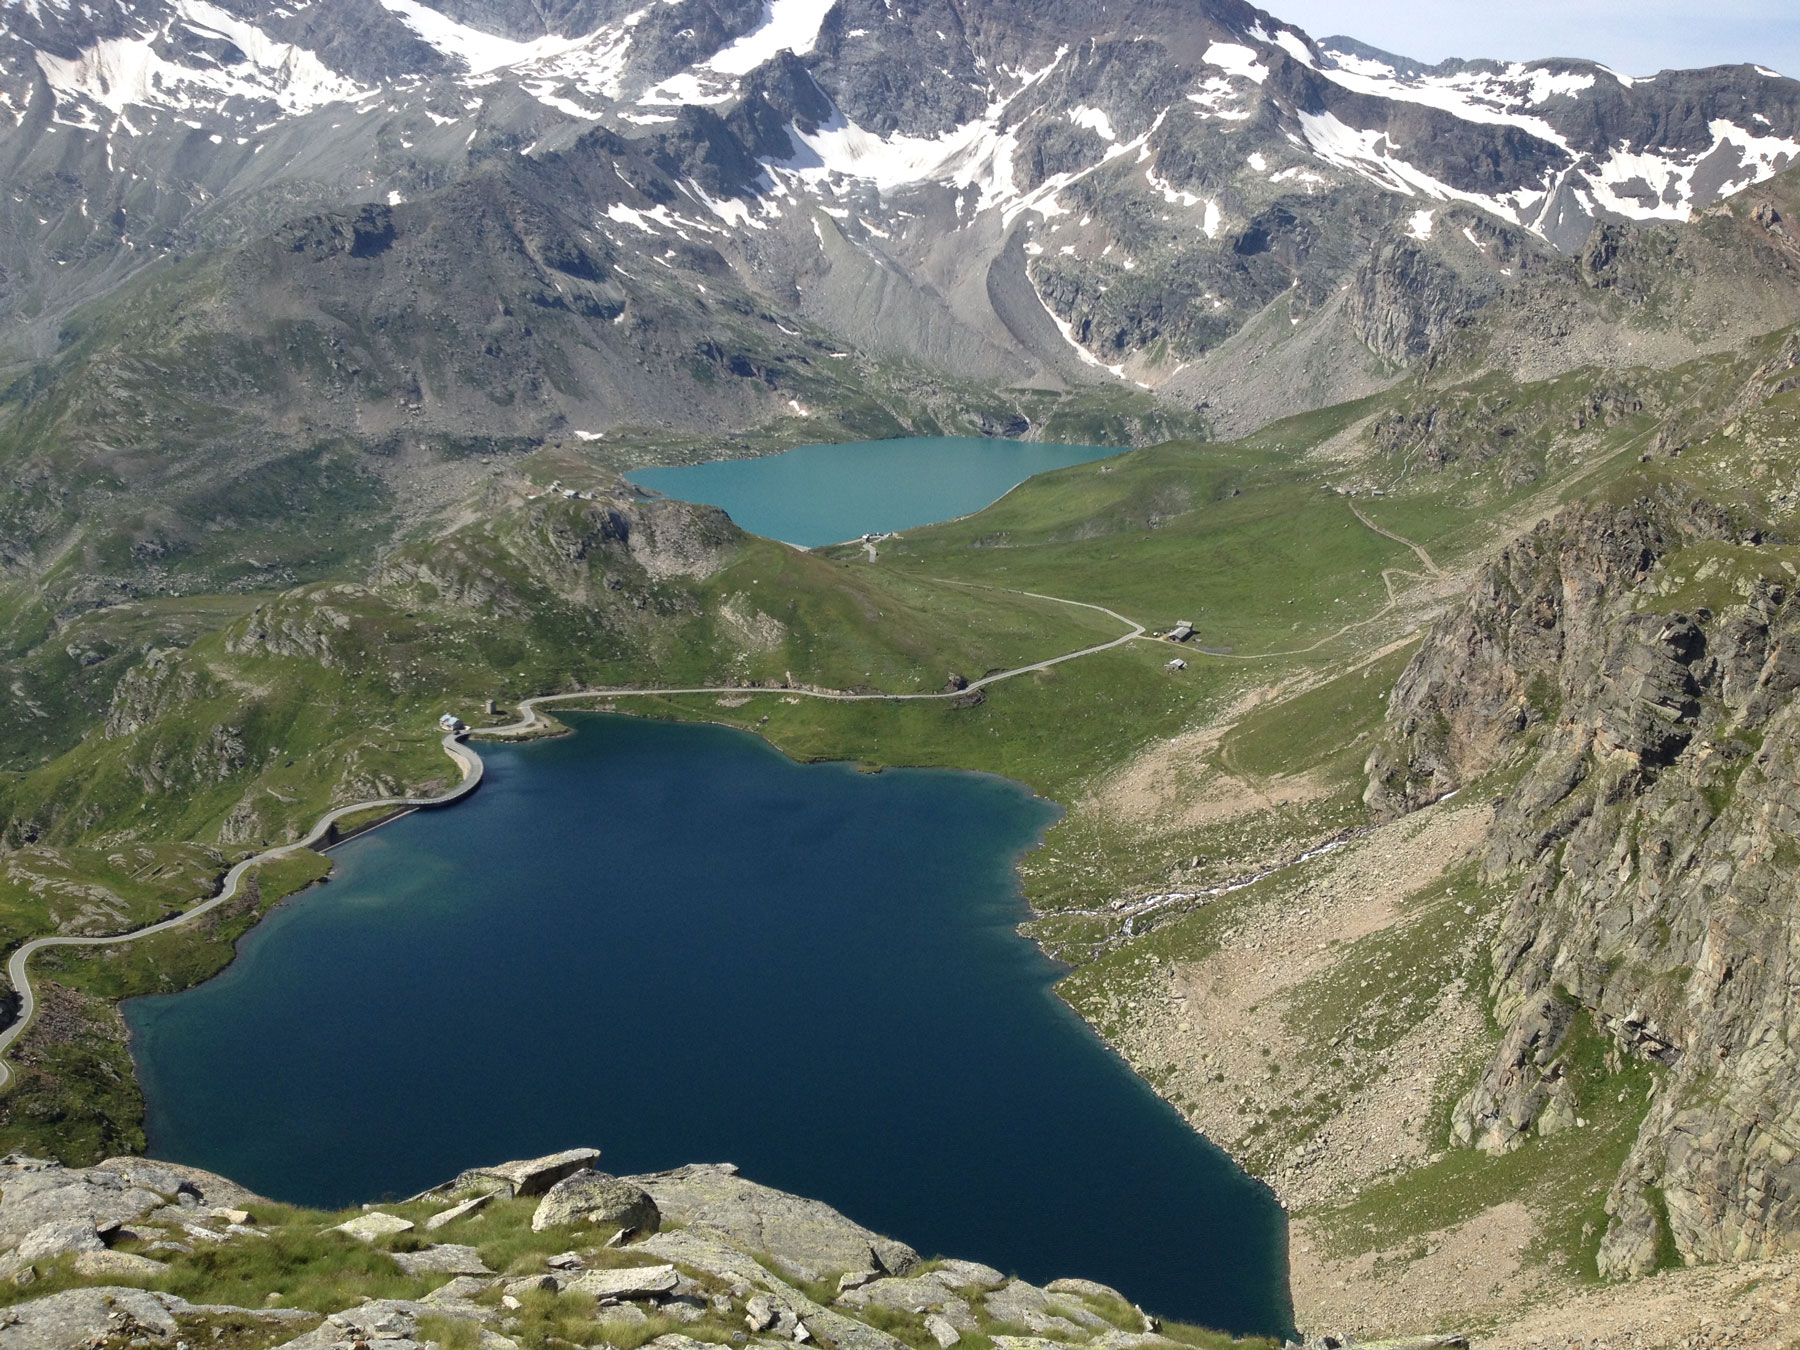 """Lago Serrù Valle dell'Orco"" - iPhone 4s - immagine di DJ Tommy (tcassano[at]aminstruments.com)"